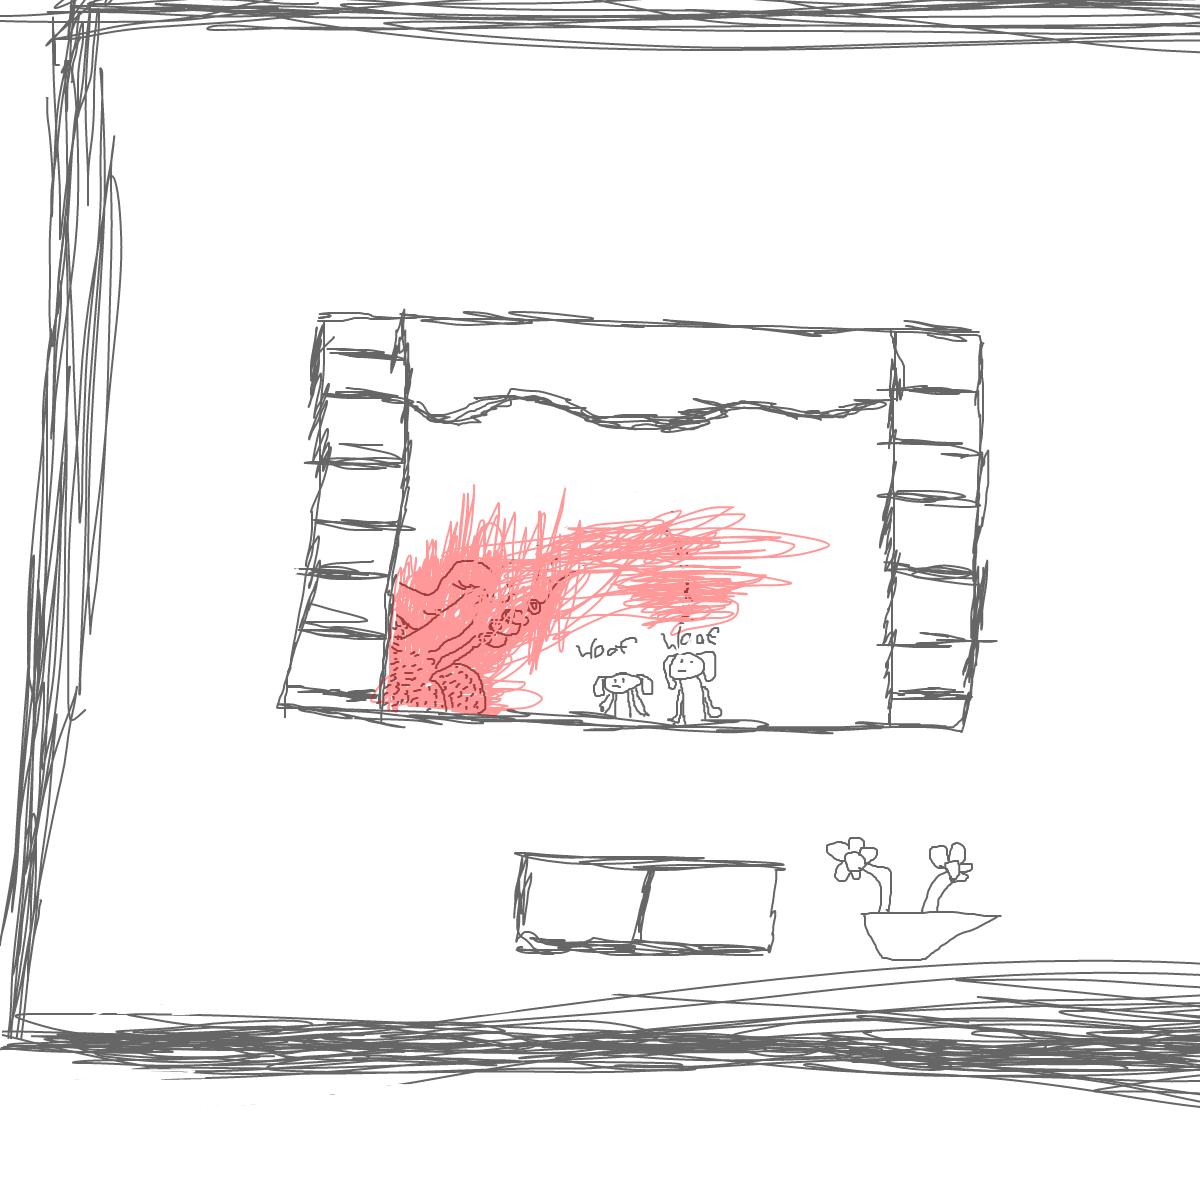 BAAAM drawing#20531 lat:45.0637016296386700lng: -64.4479217529296900